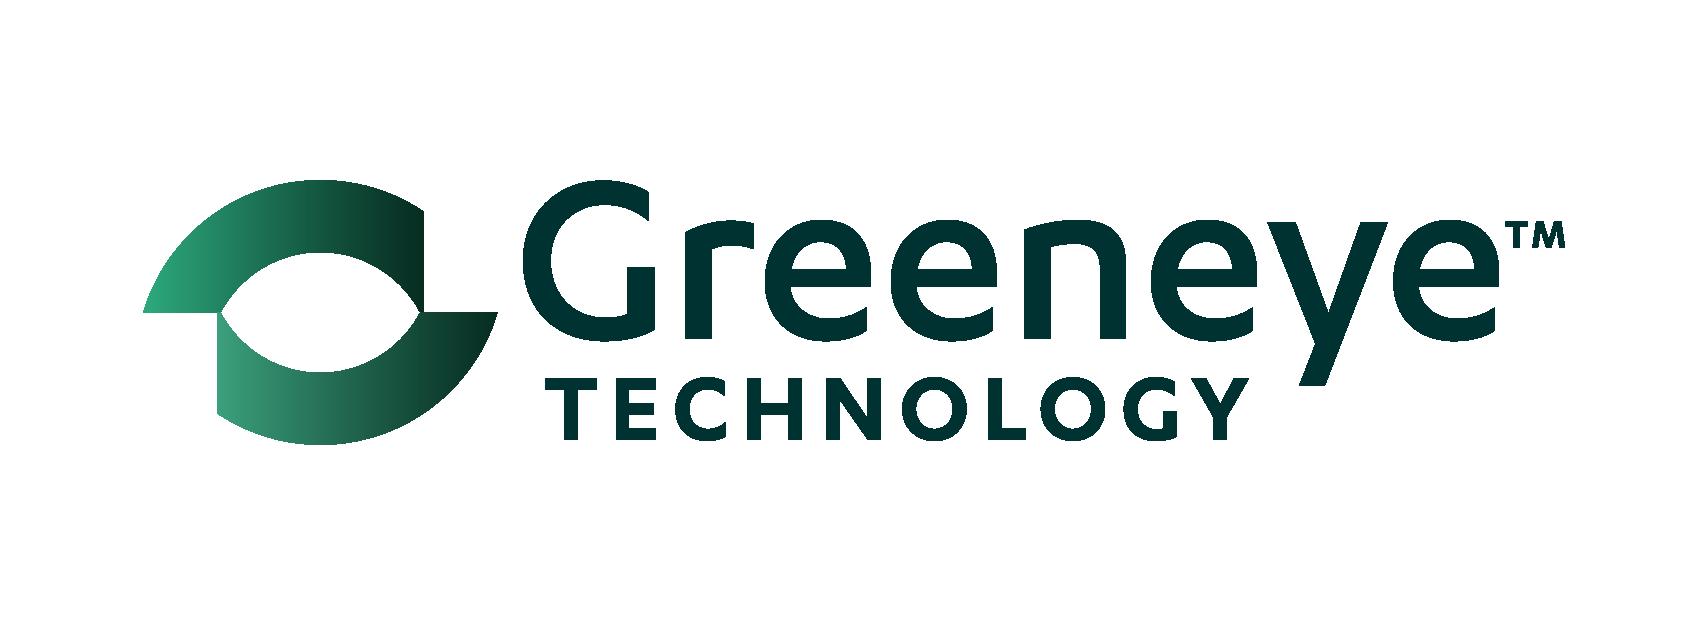 Greeneye Technology logo